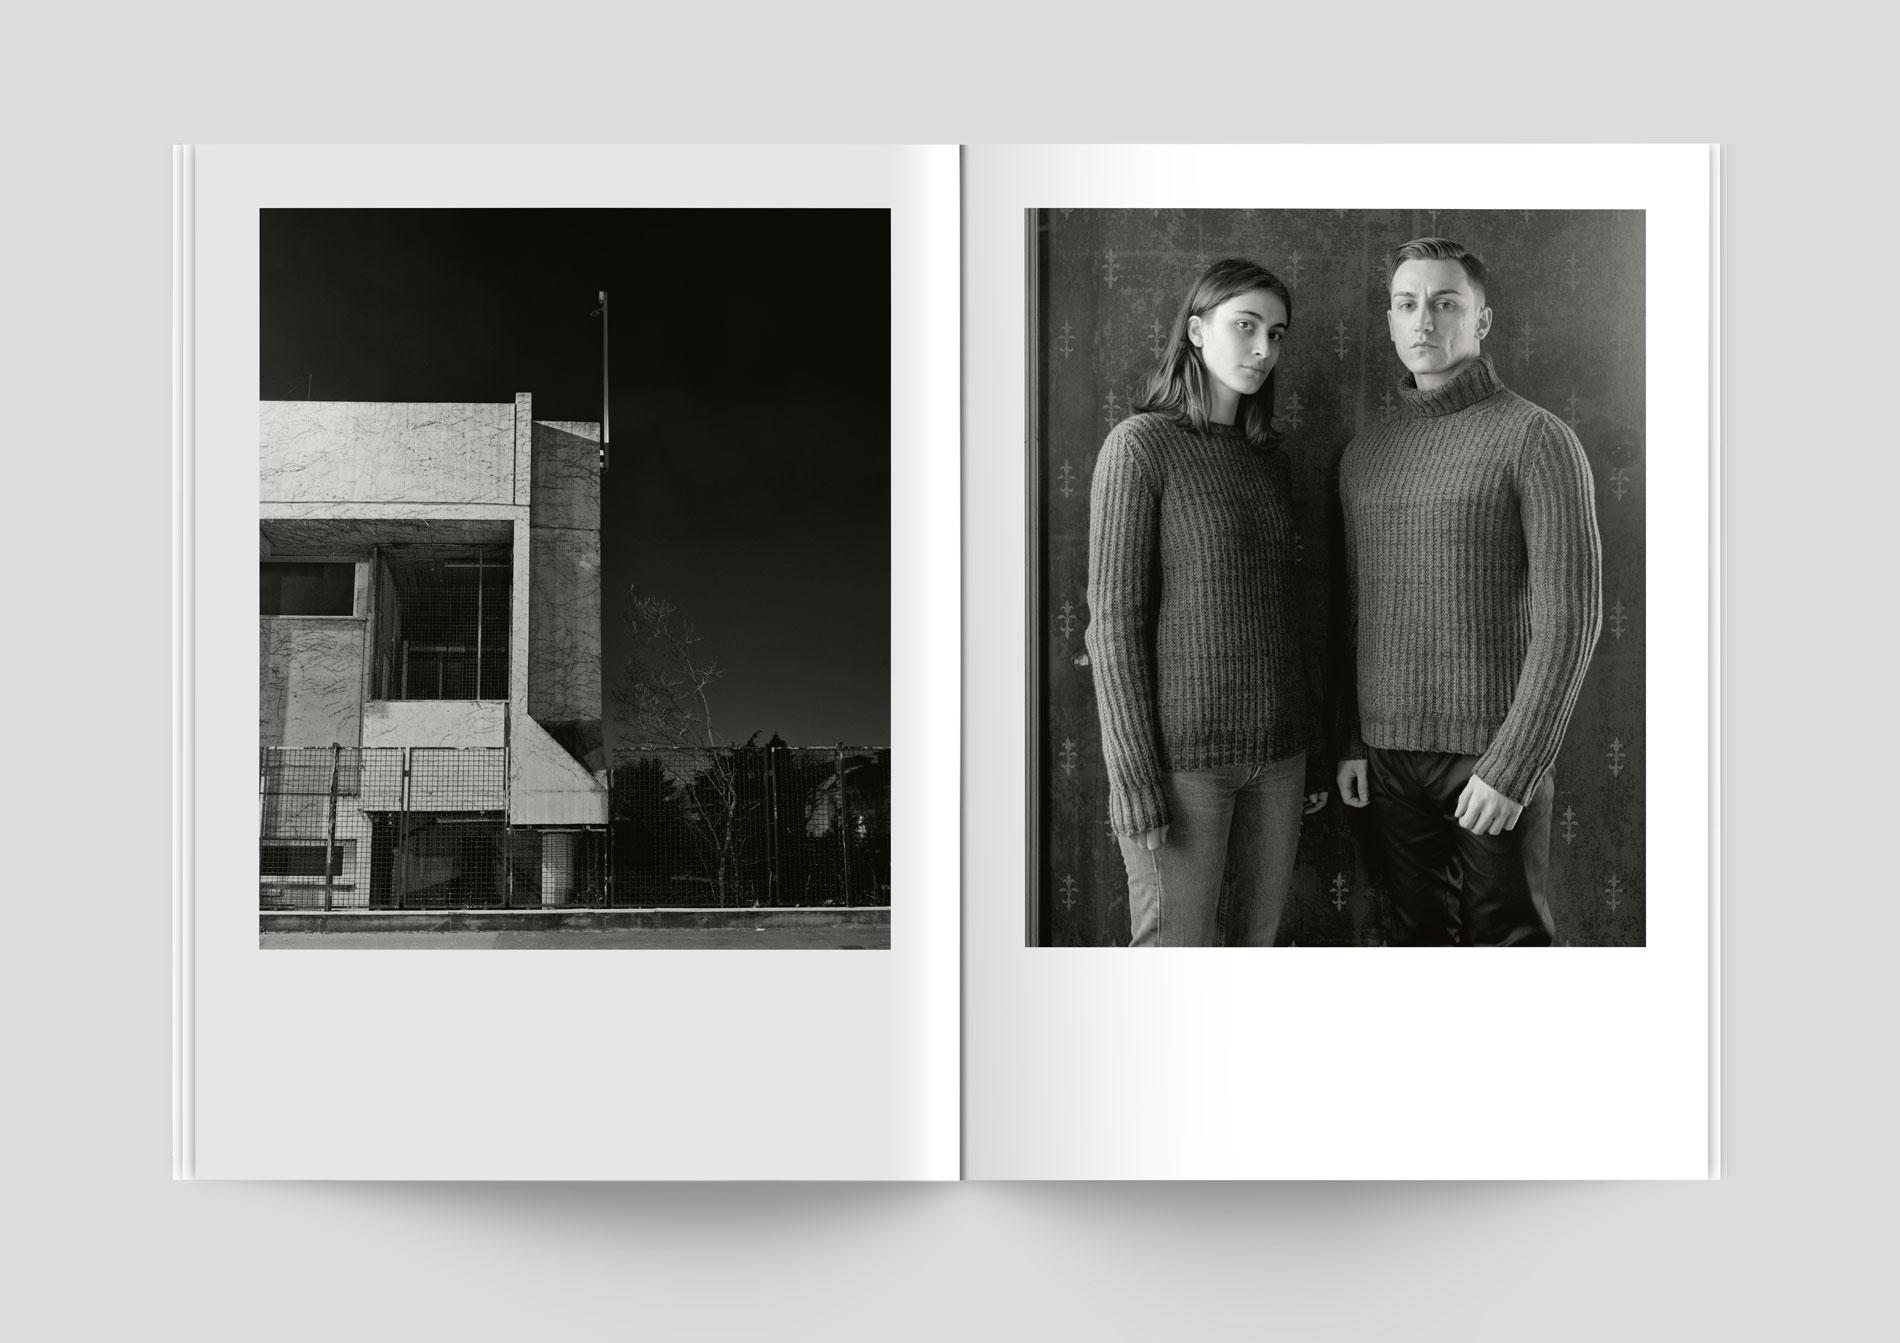 Santoni-Edited-by-Marco-Zanini-Ingar-Krauss-02